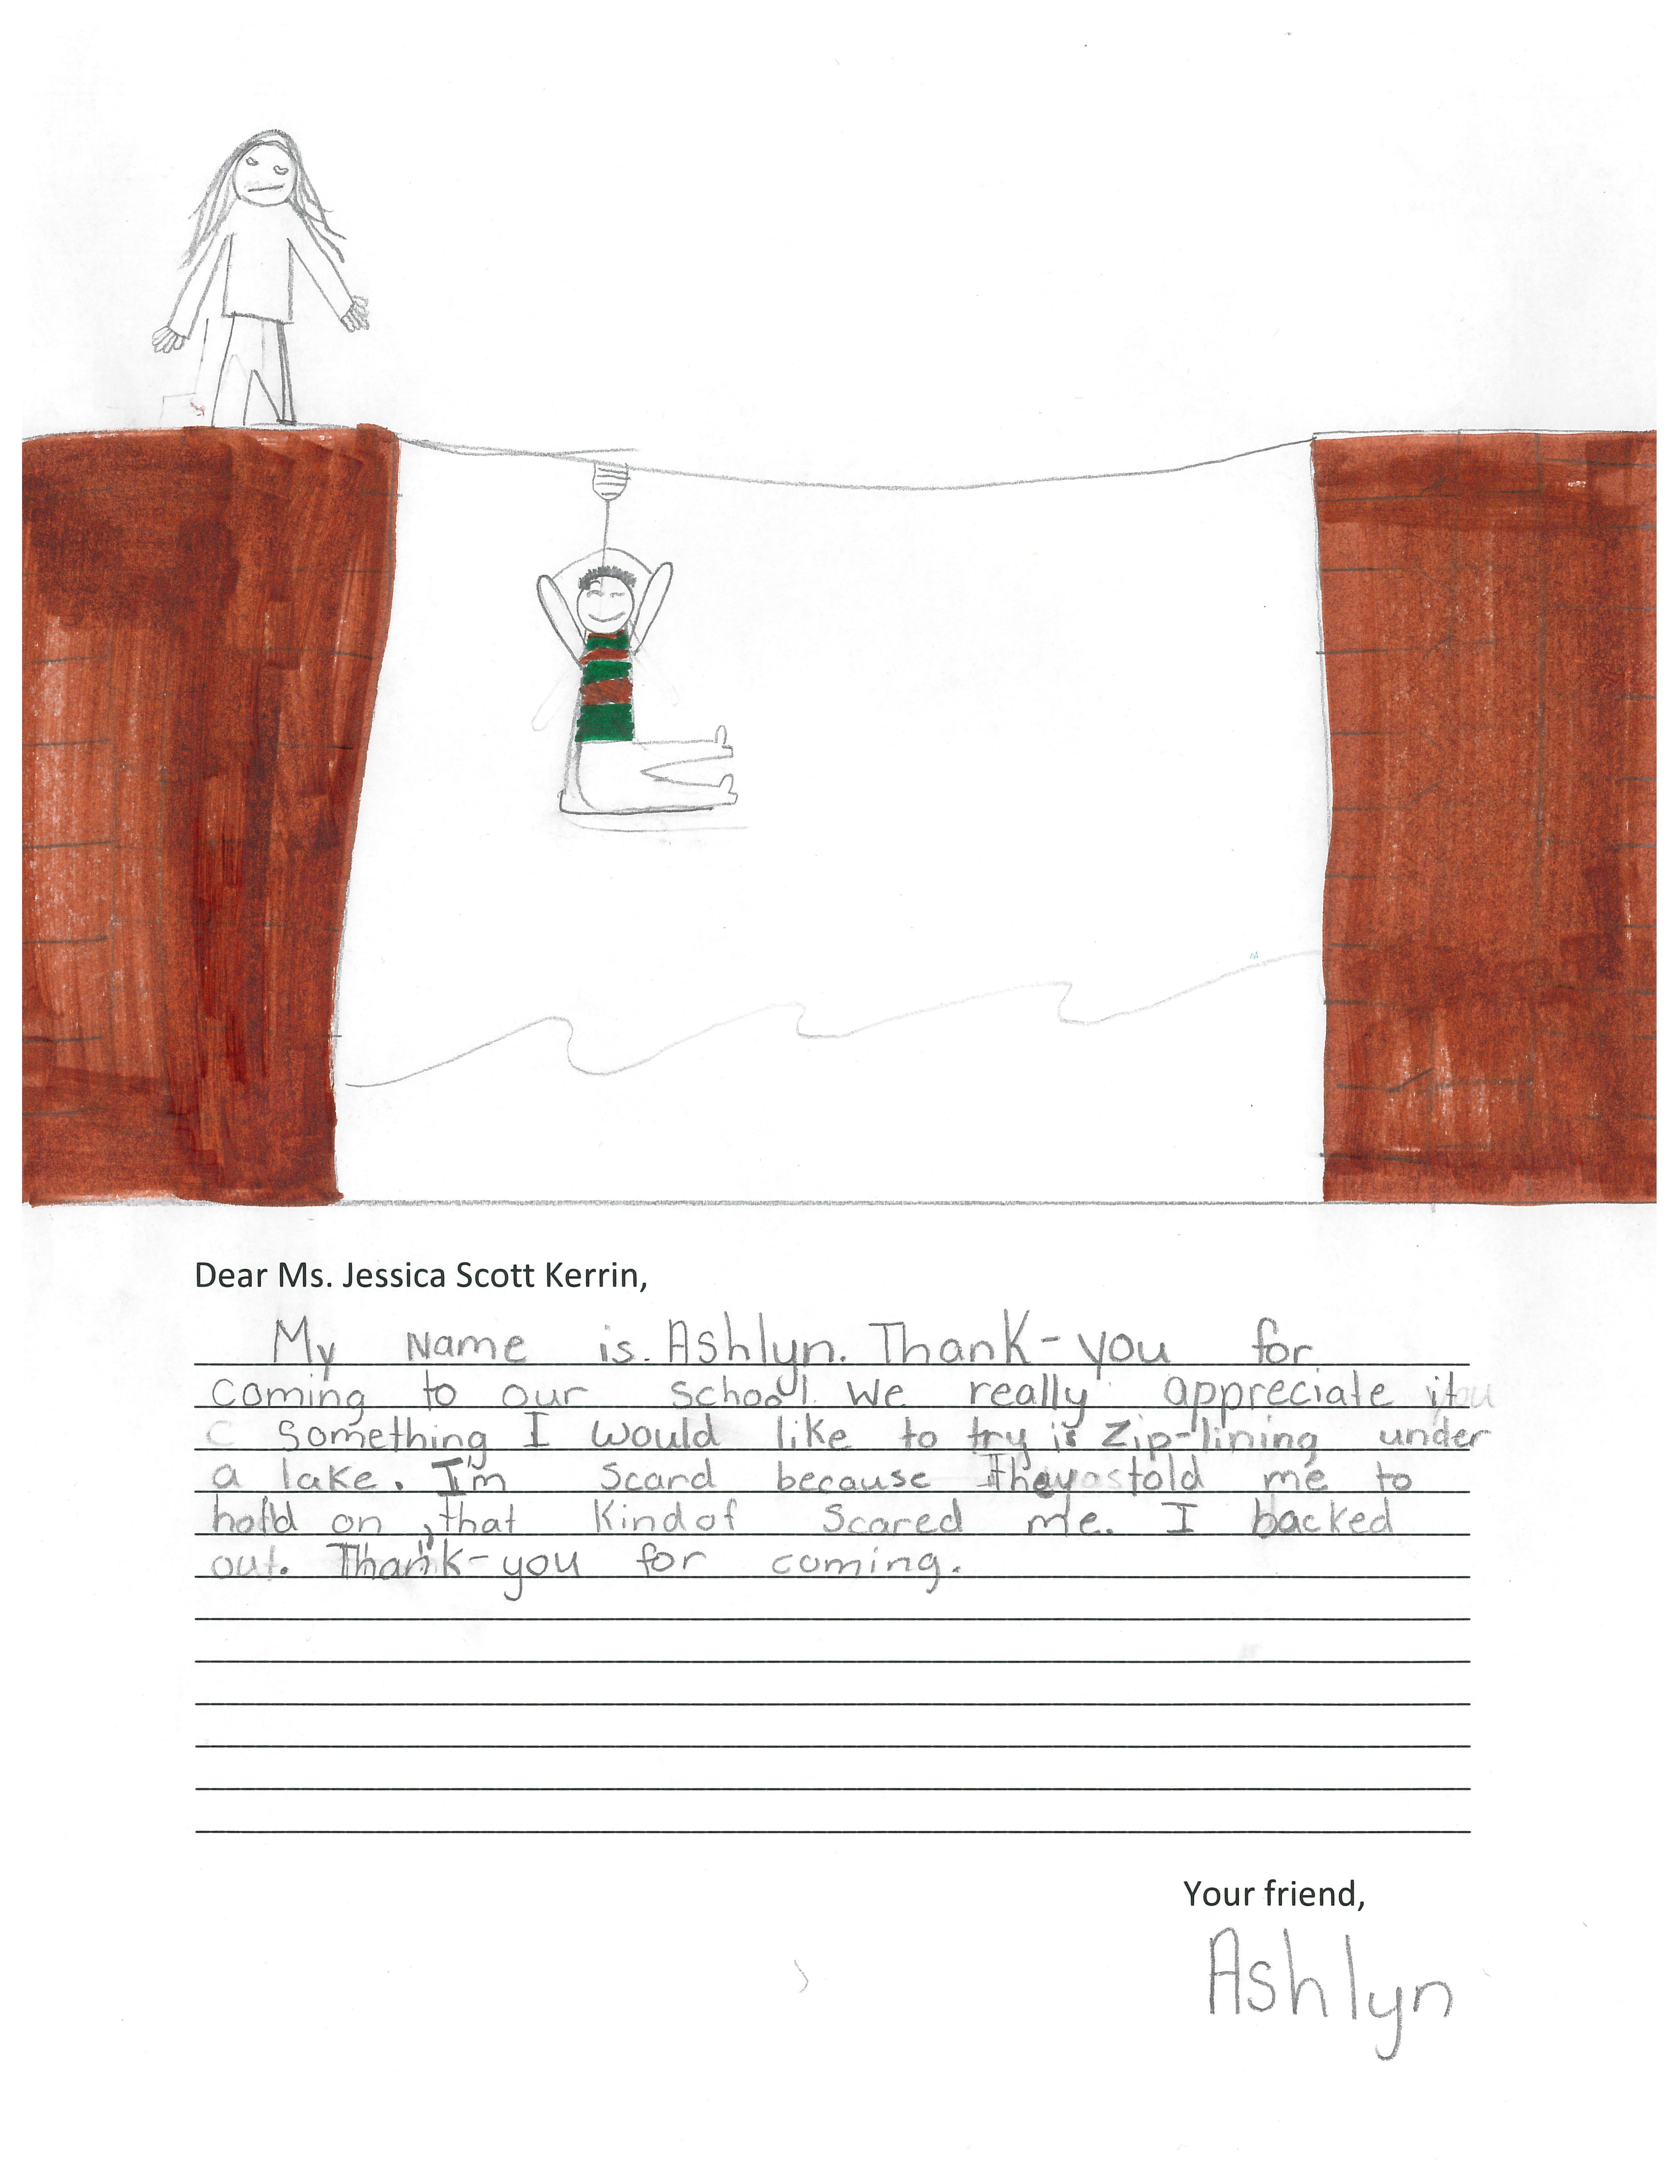 Child's drawing of ziplining